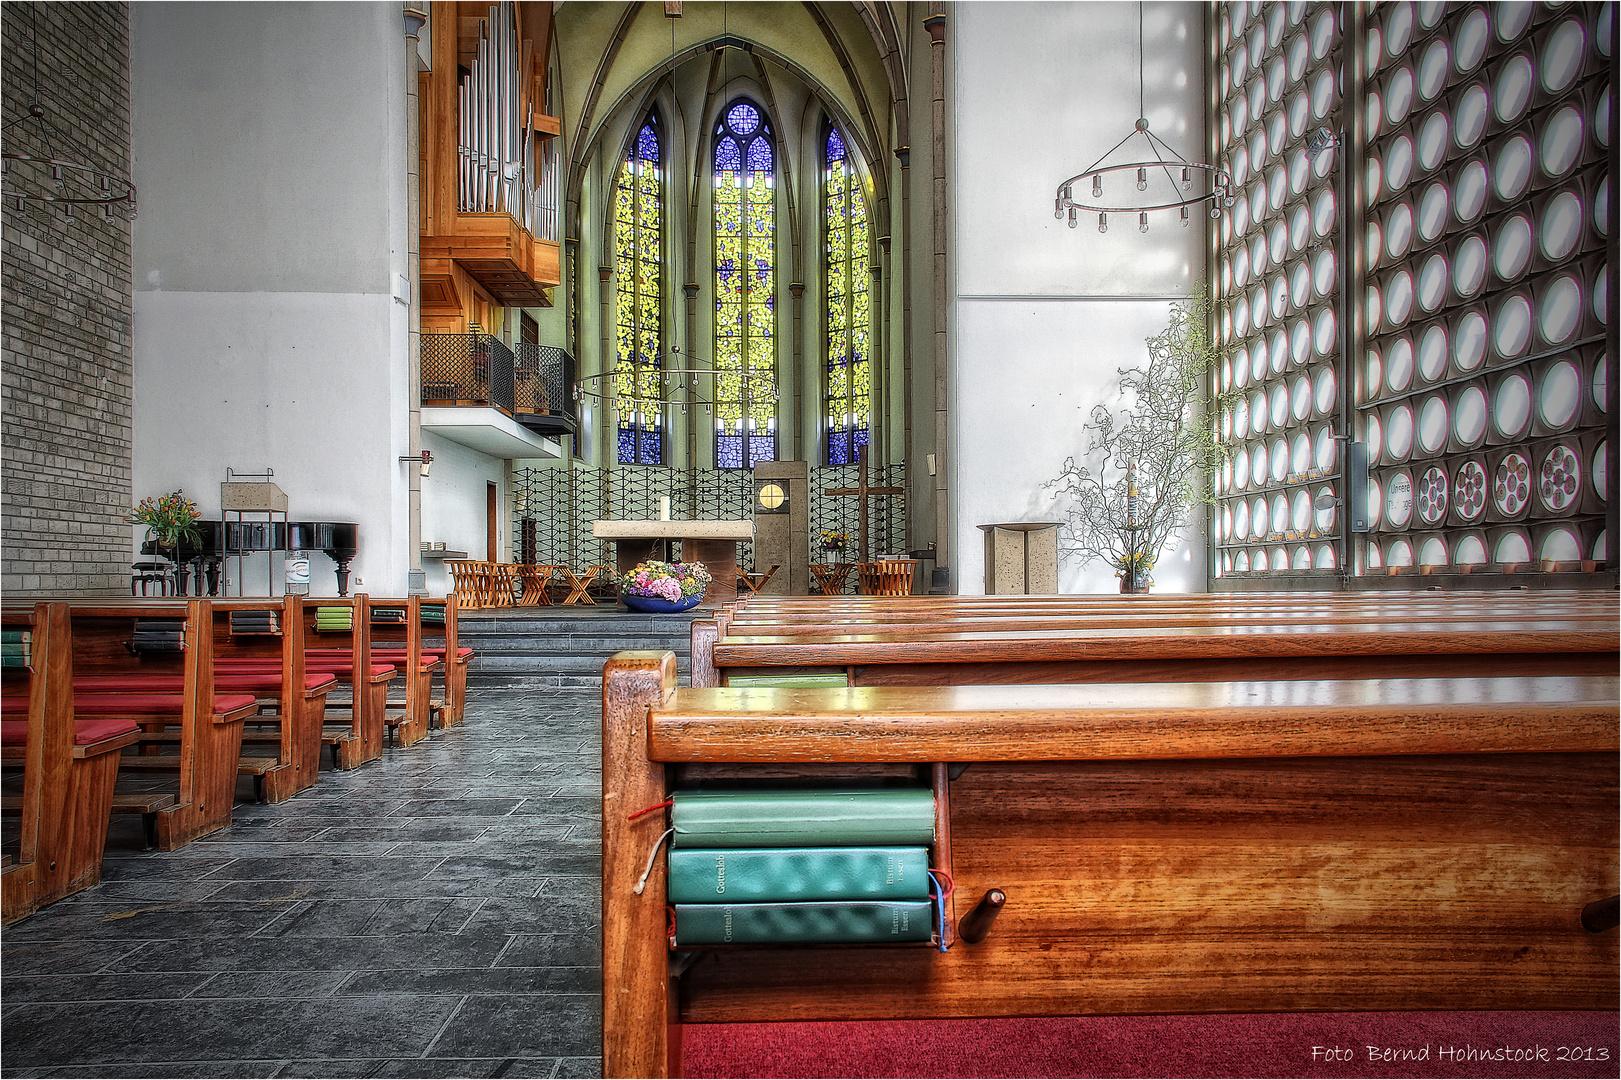 Karmelkirche zu Duisburg  ....